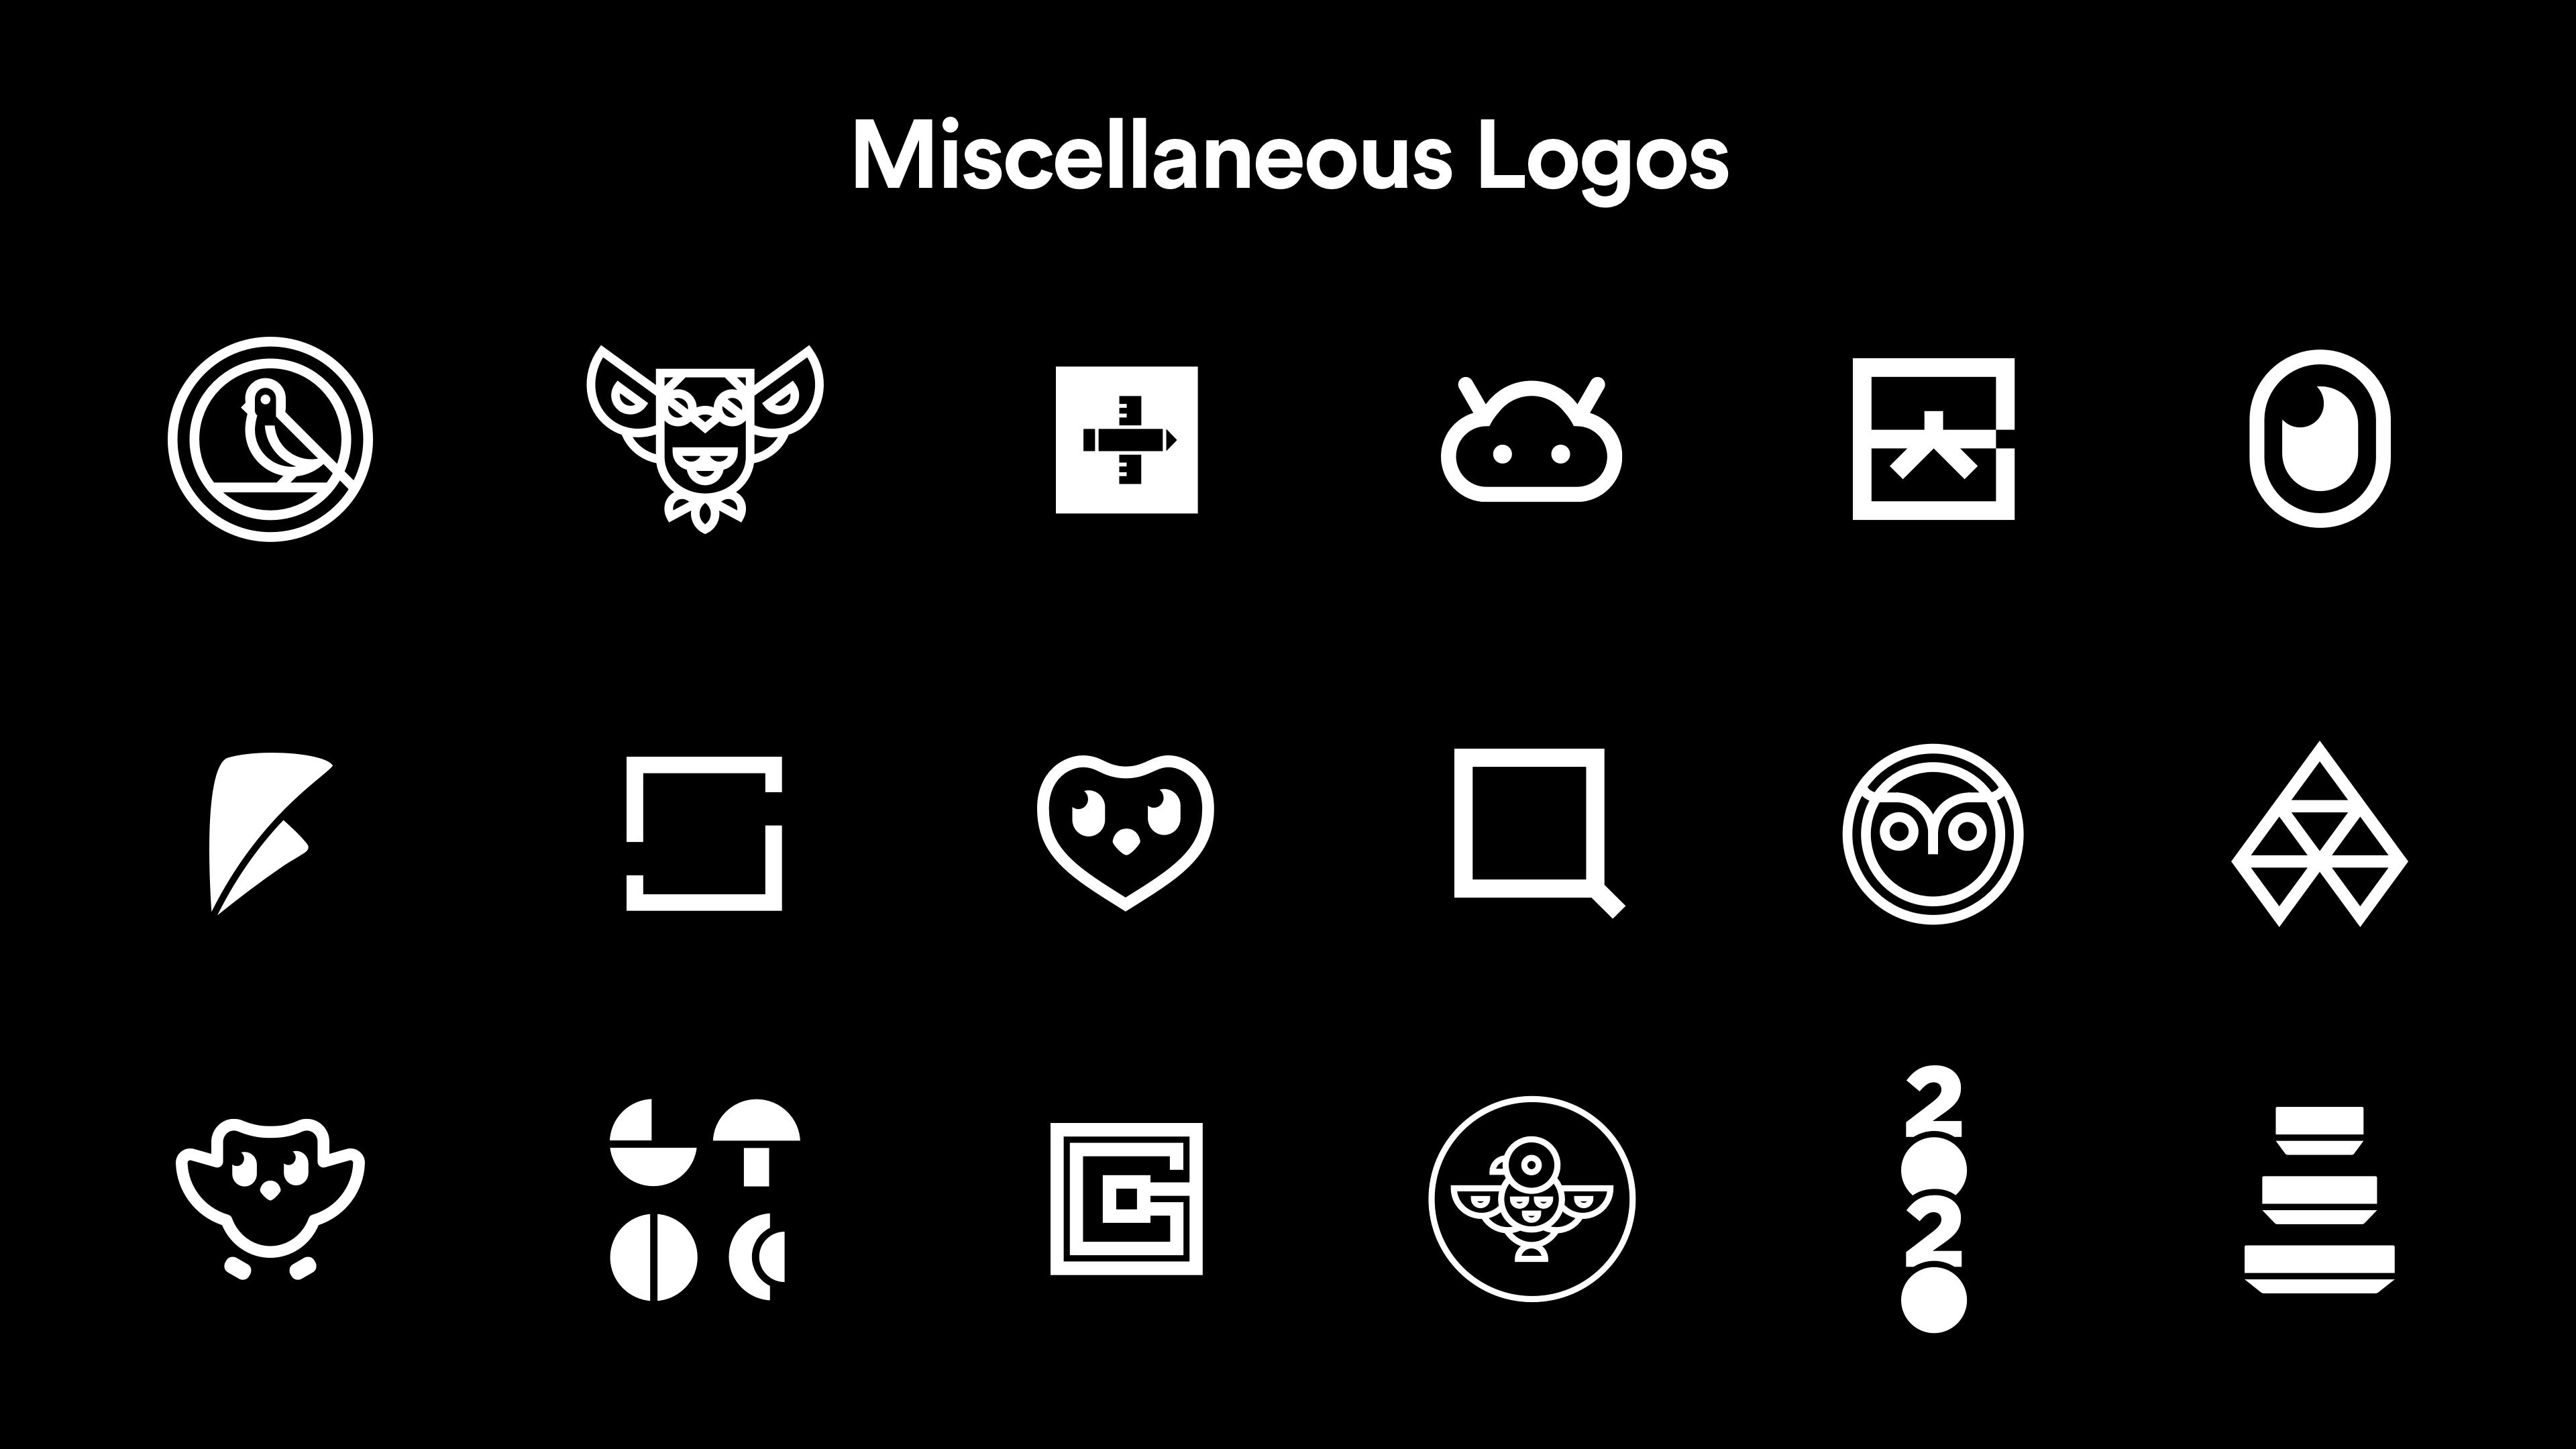 Logos by Jack Morgan